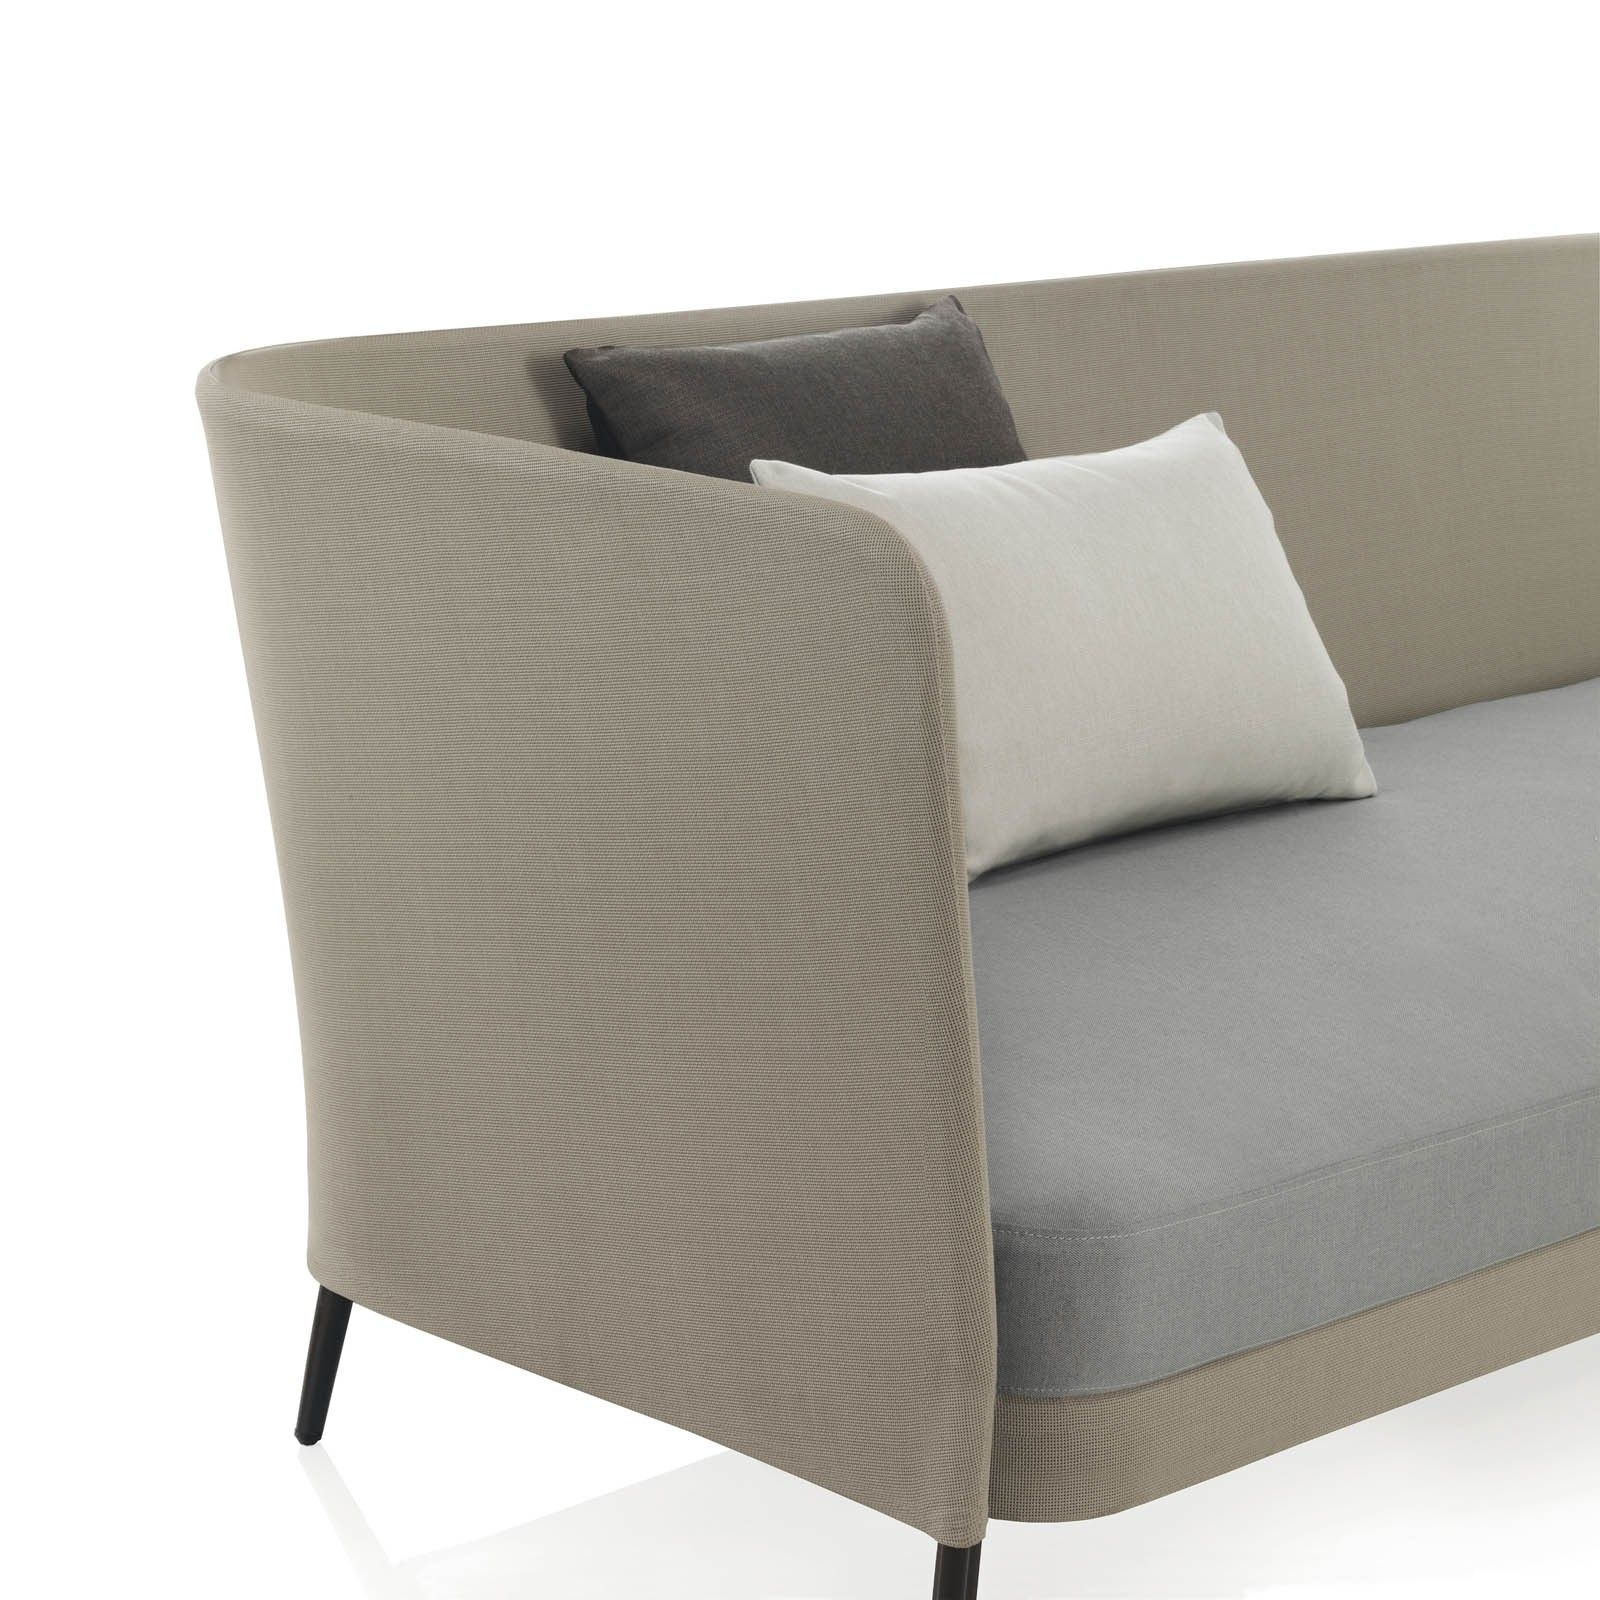 KABU KEZU Furniture residential and contract